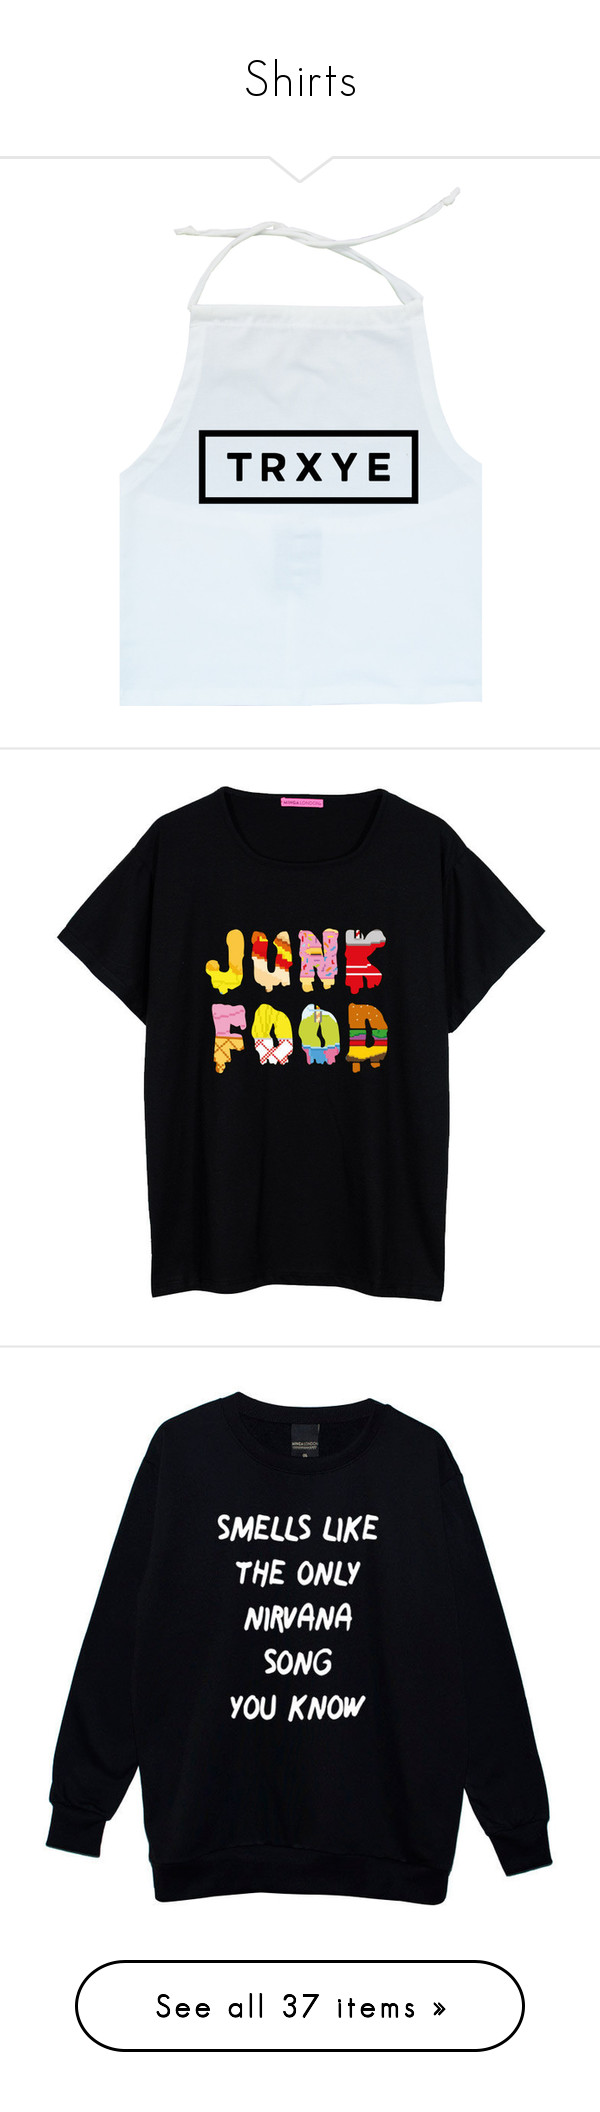 Shirts Shirts Hipster Shirts Strappy Crop Top [ 2112 x 600 Pixel ]